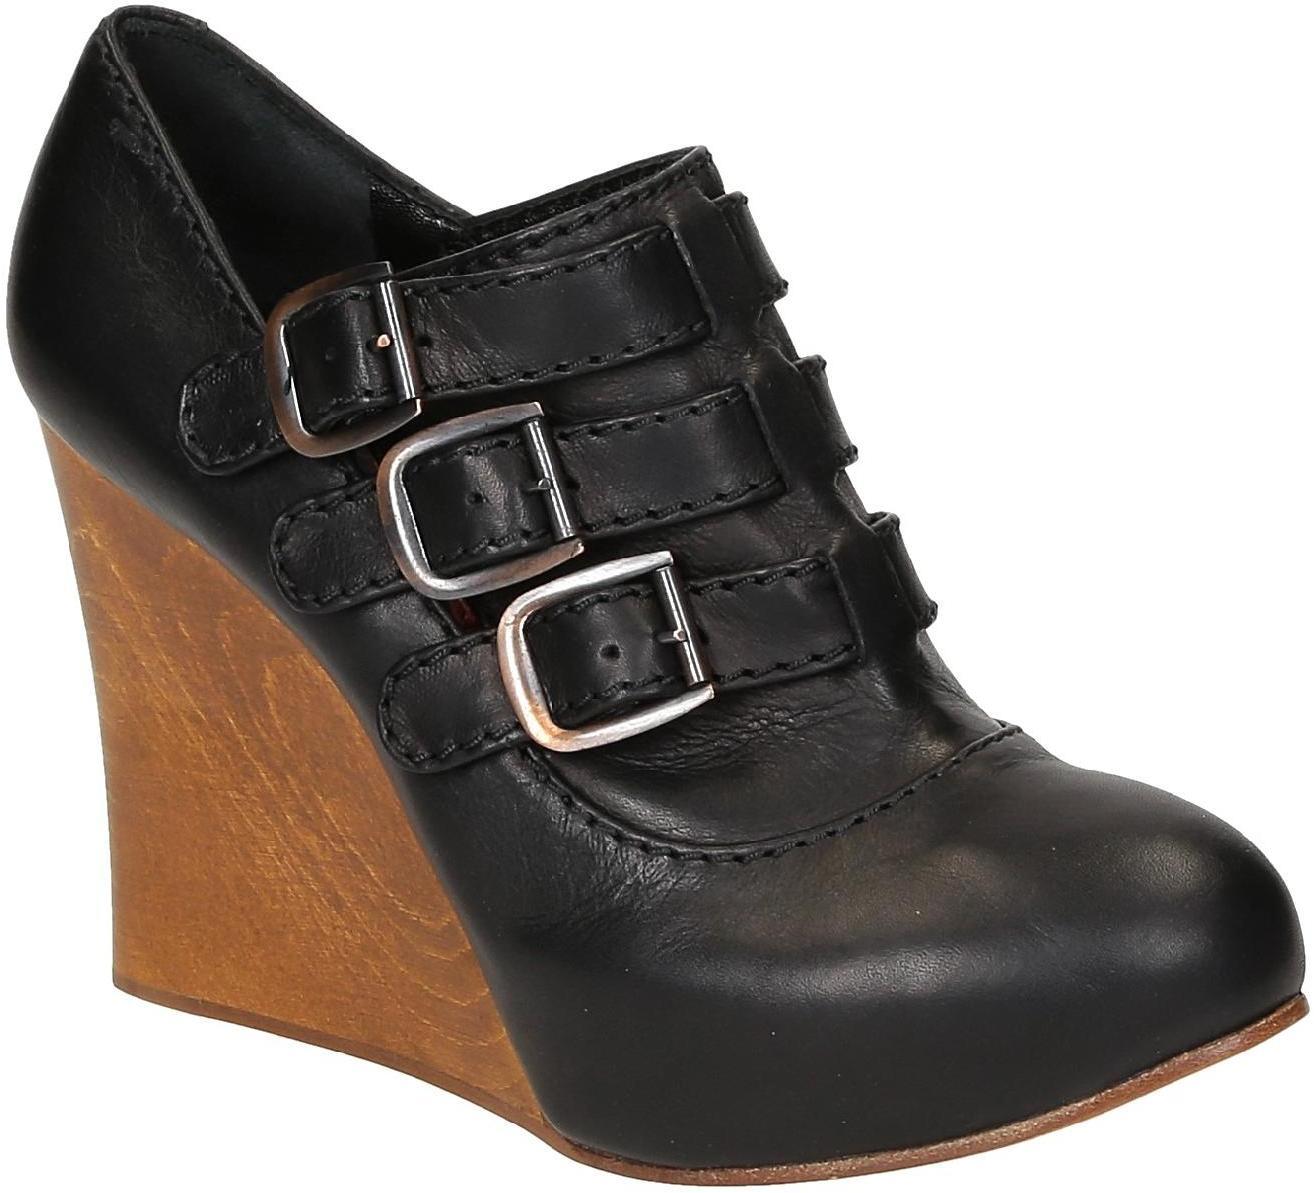 Outlet scarpe donna Chloé originali - Italian Boutique 53efd3b4689